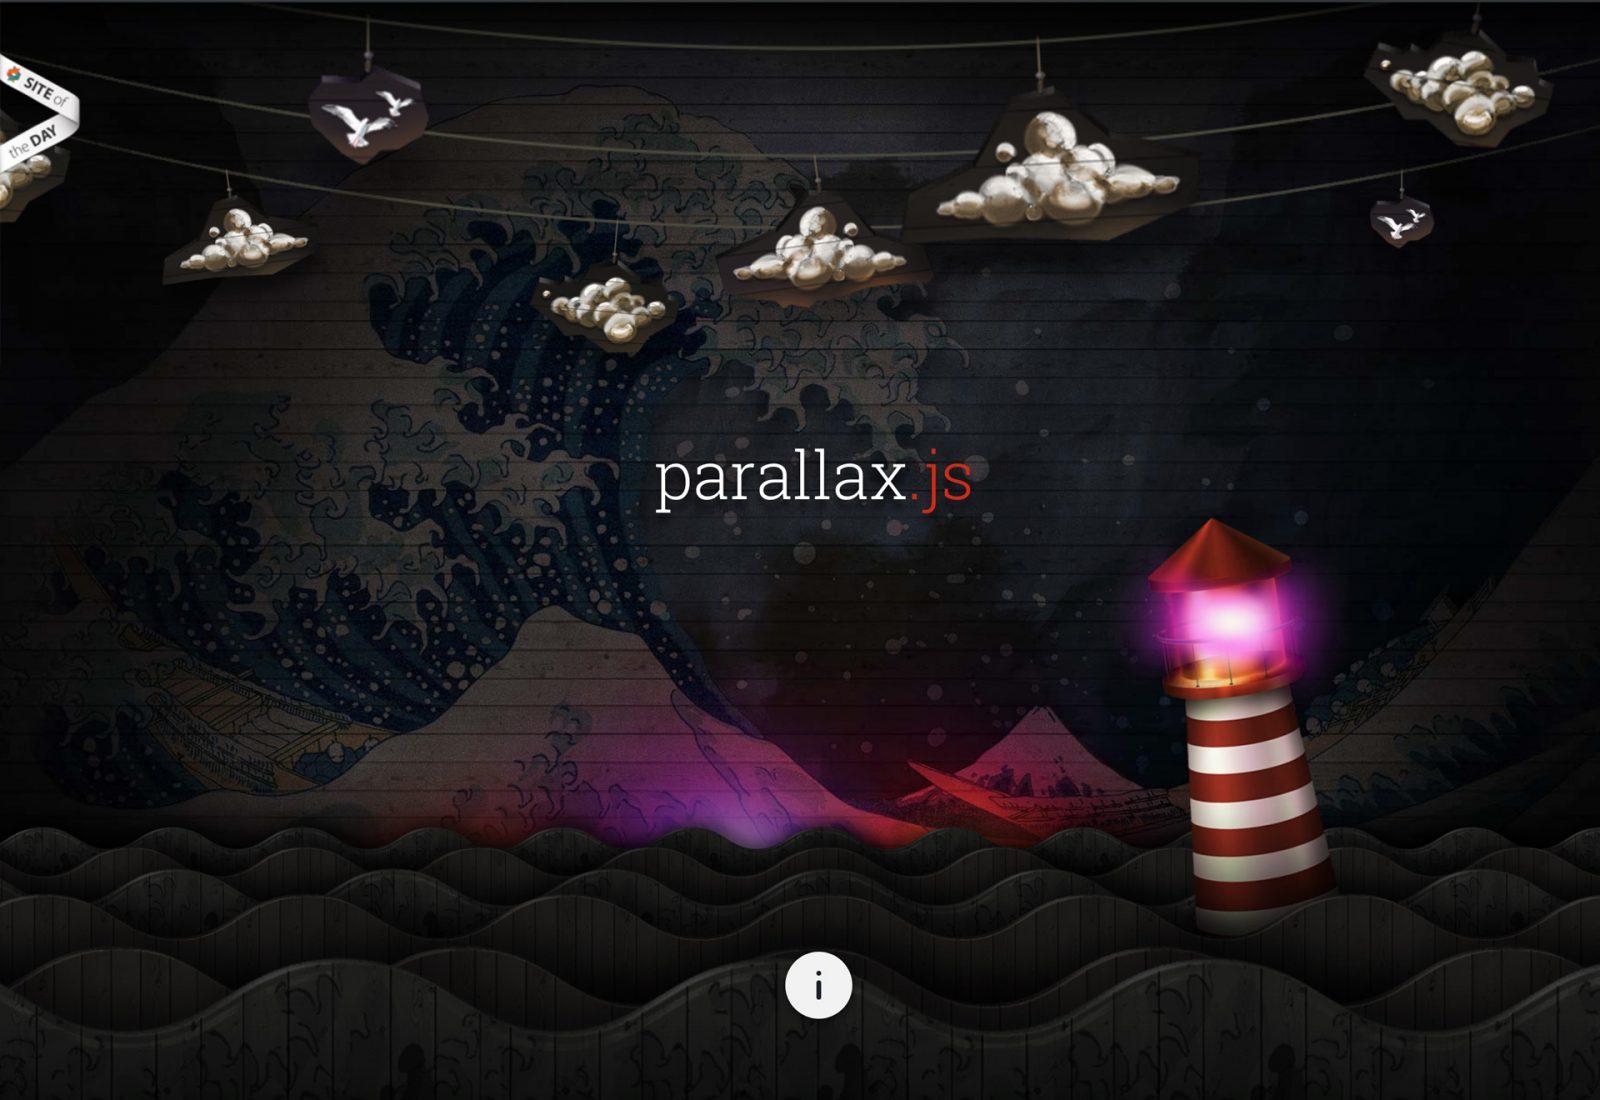 Parallax JS by Matthew Wagerfield & Claudio Guglieri